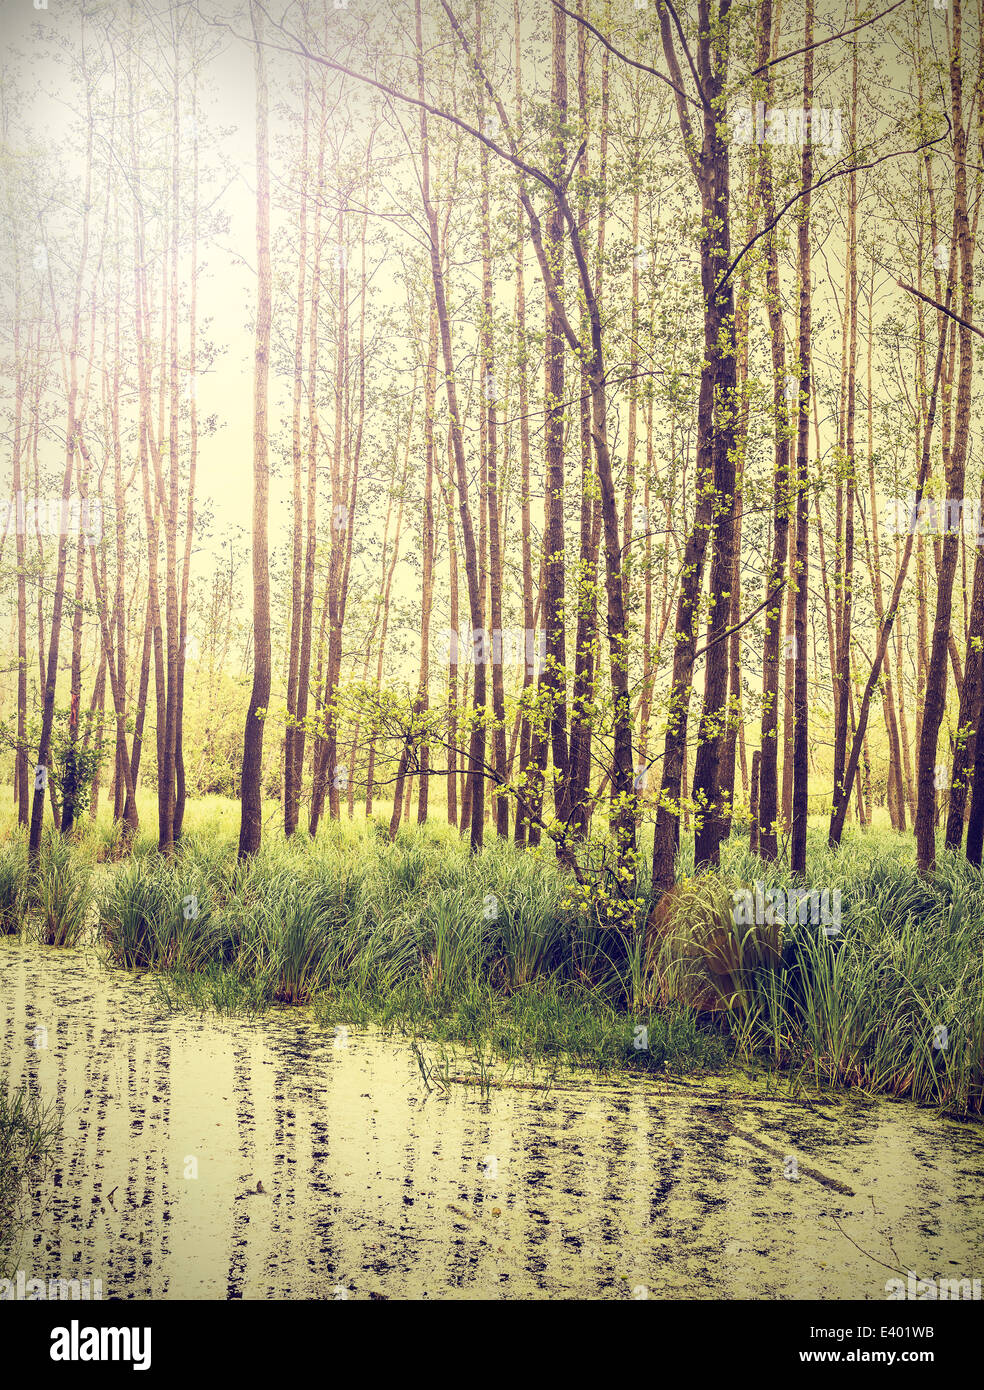 Peaceful nature vintage background. - Stock Image